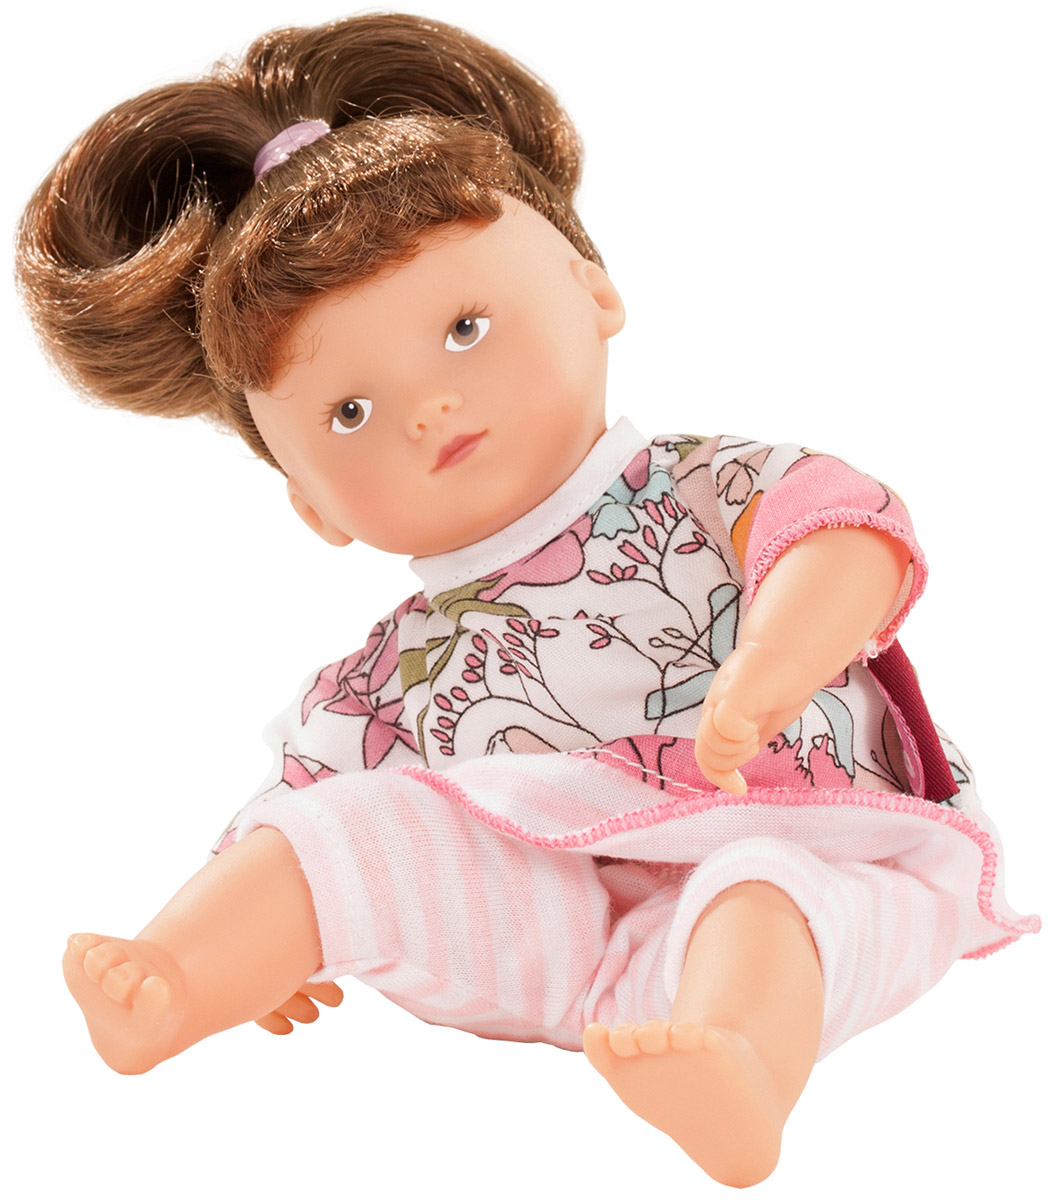 Gotz Пупс Мини Маффин шатенка куклы и одежда для кукол gotz мини маффин 22 см